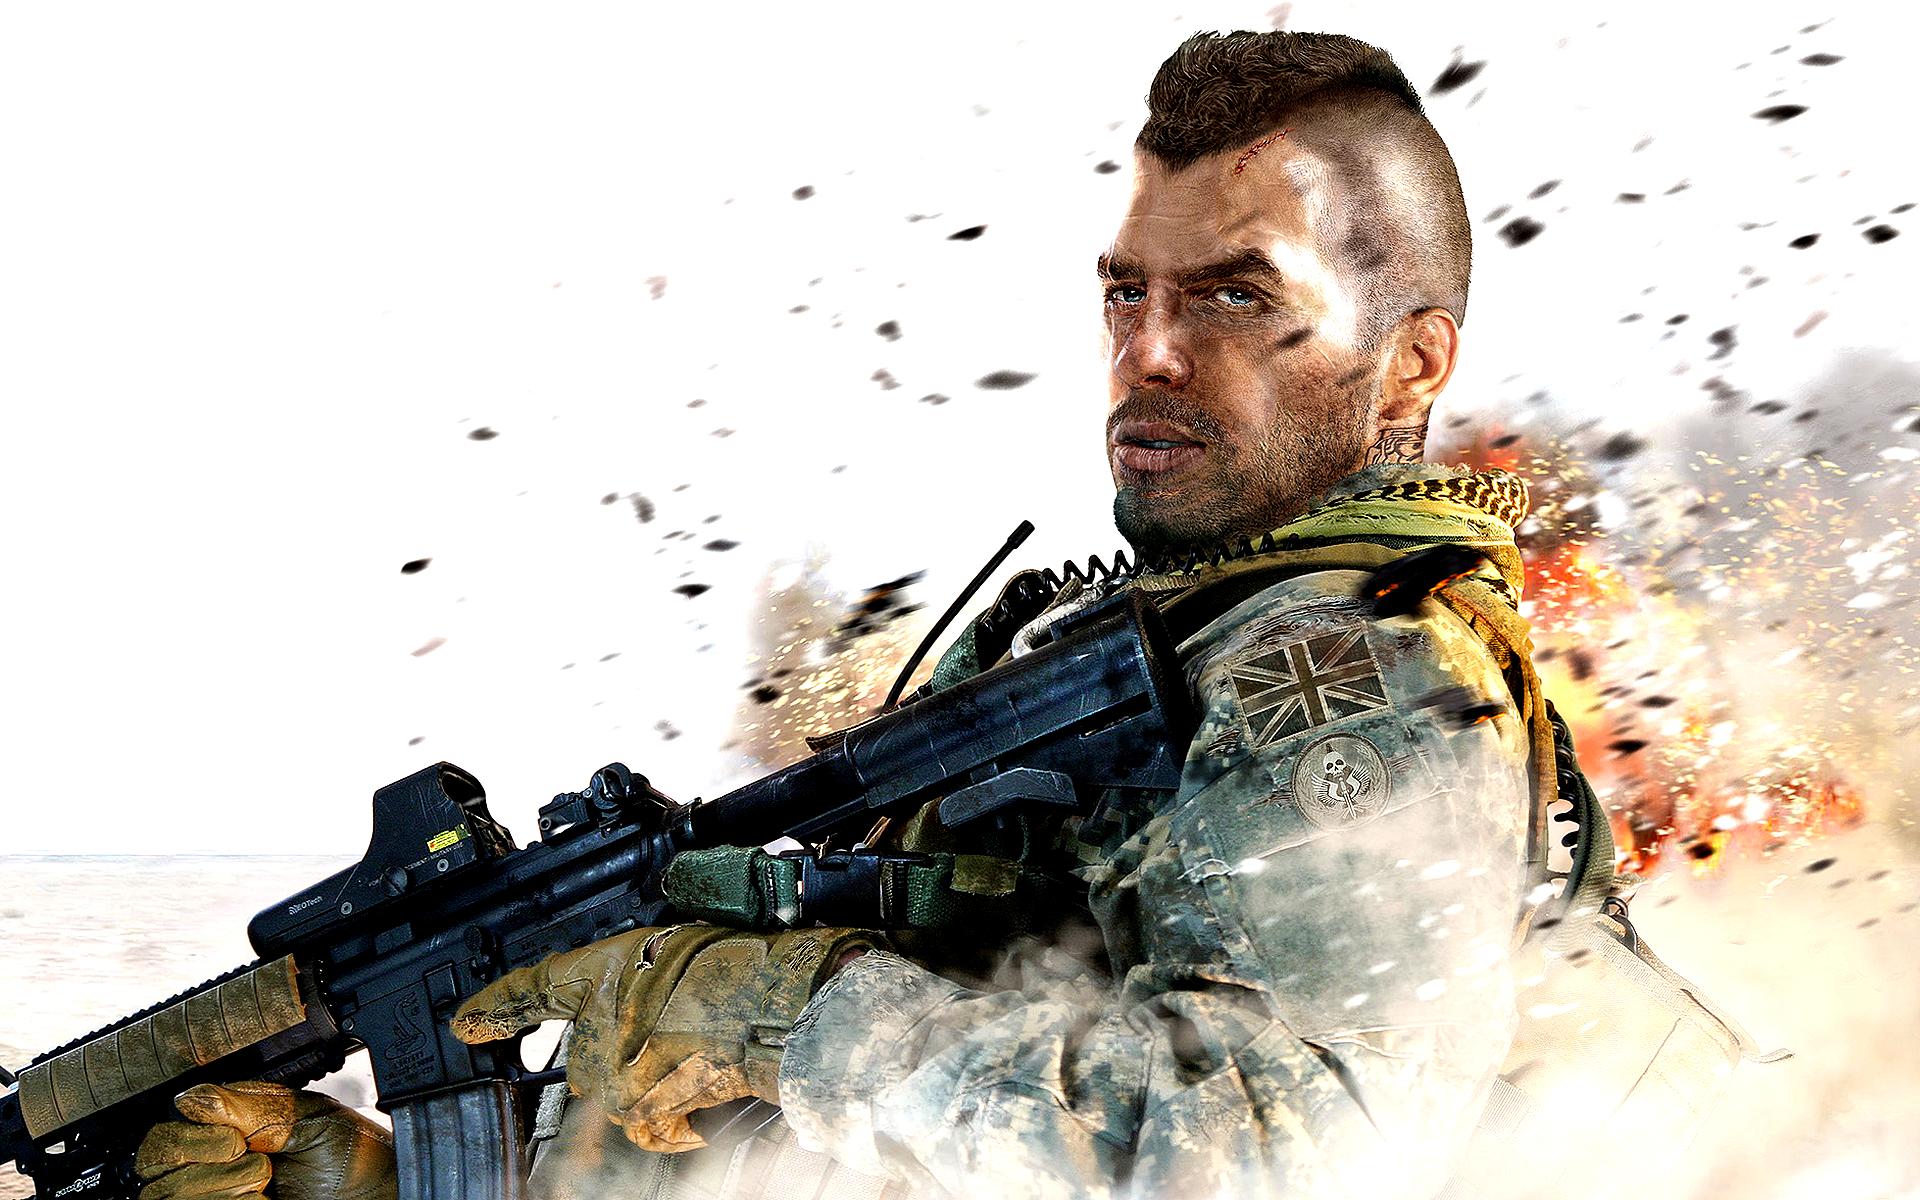 Assassins Creed 2 Hd Wallpapers Cod Modern Warfare 2 Wallpapers Hd Wallpapers Id 7250